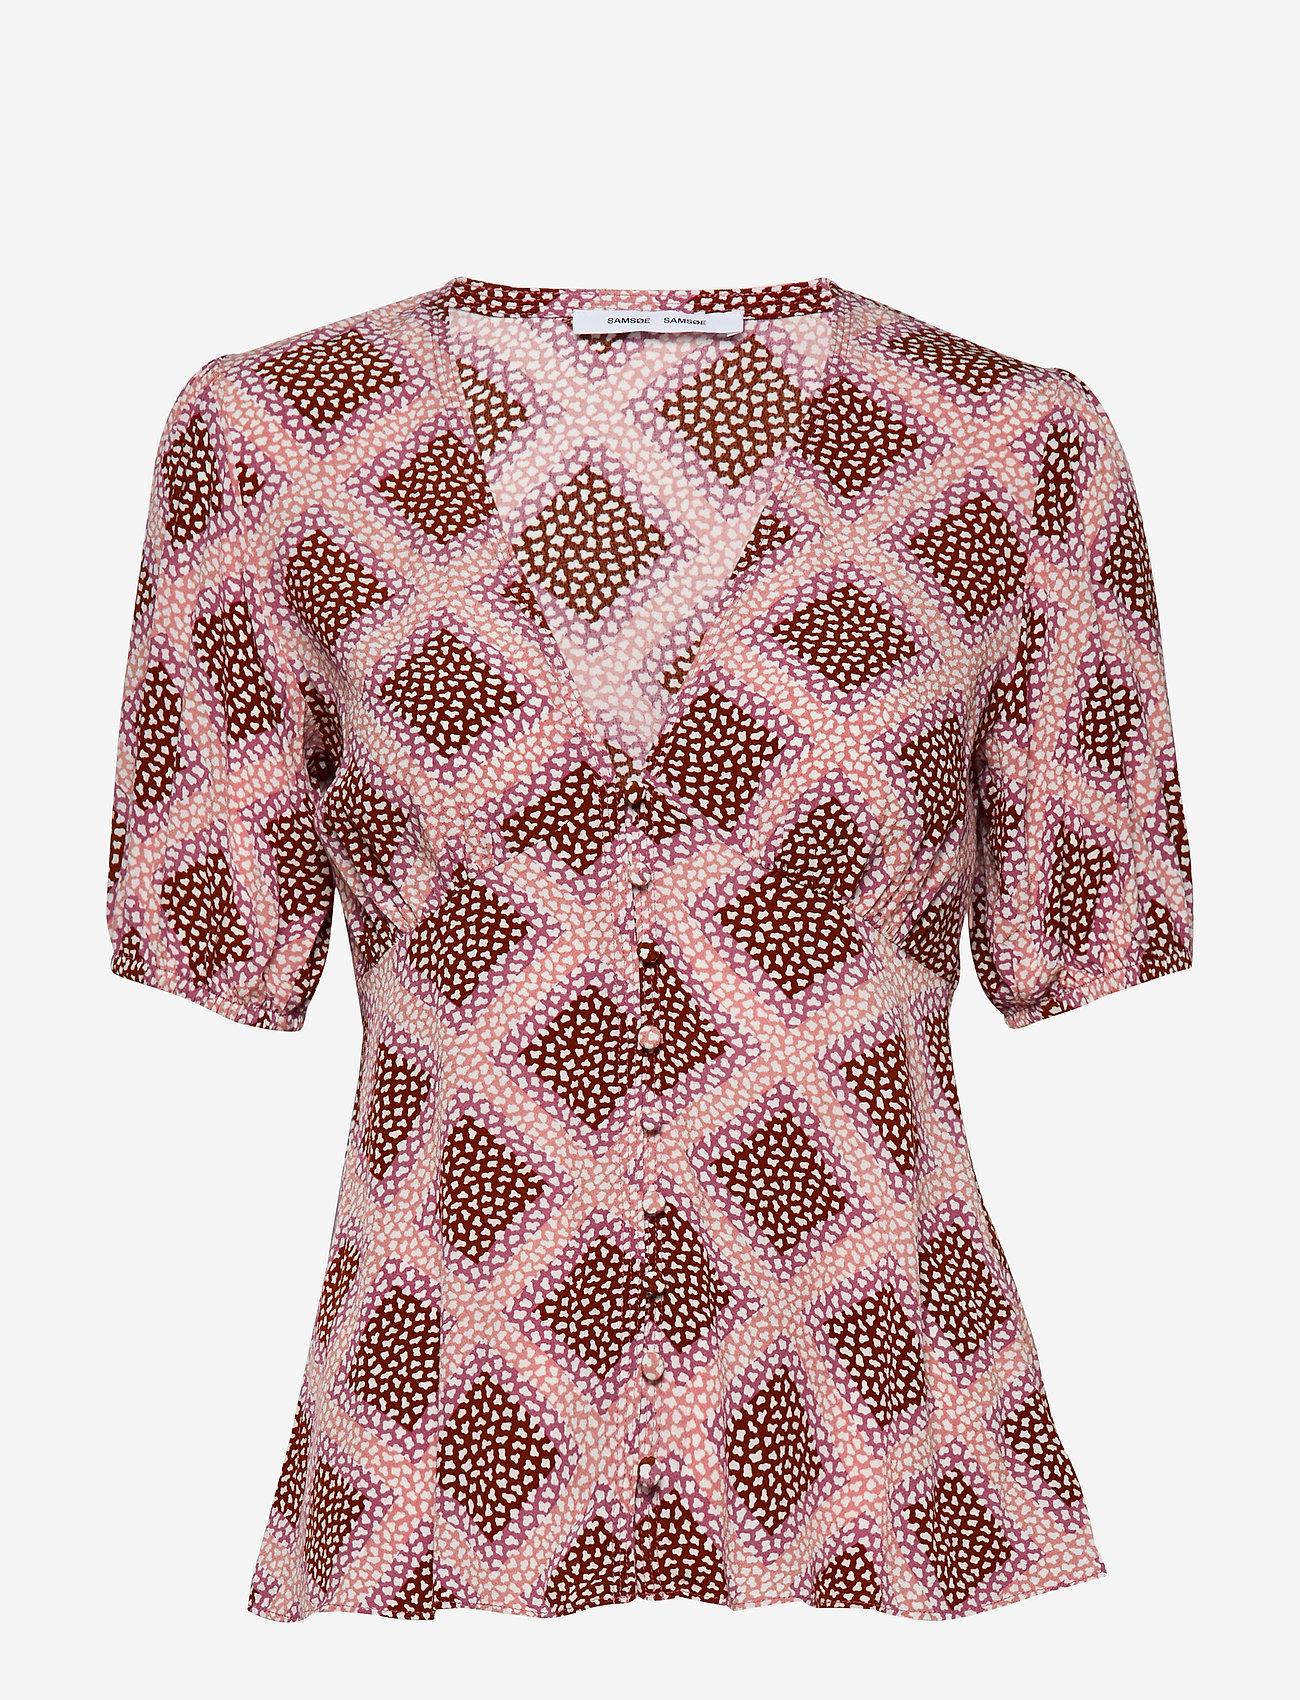 Samsøe Samsøe - Petunia ss blouse aop 10056 - blouses met korte mouwen - foulard - 0